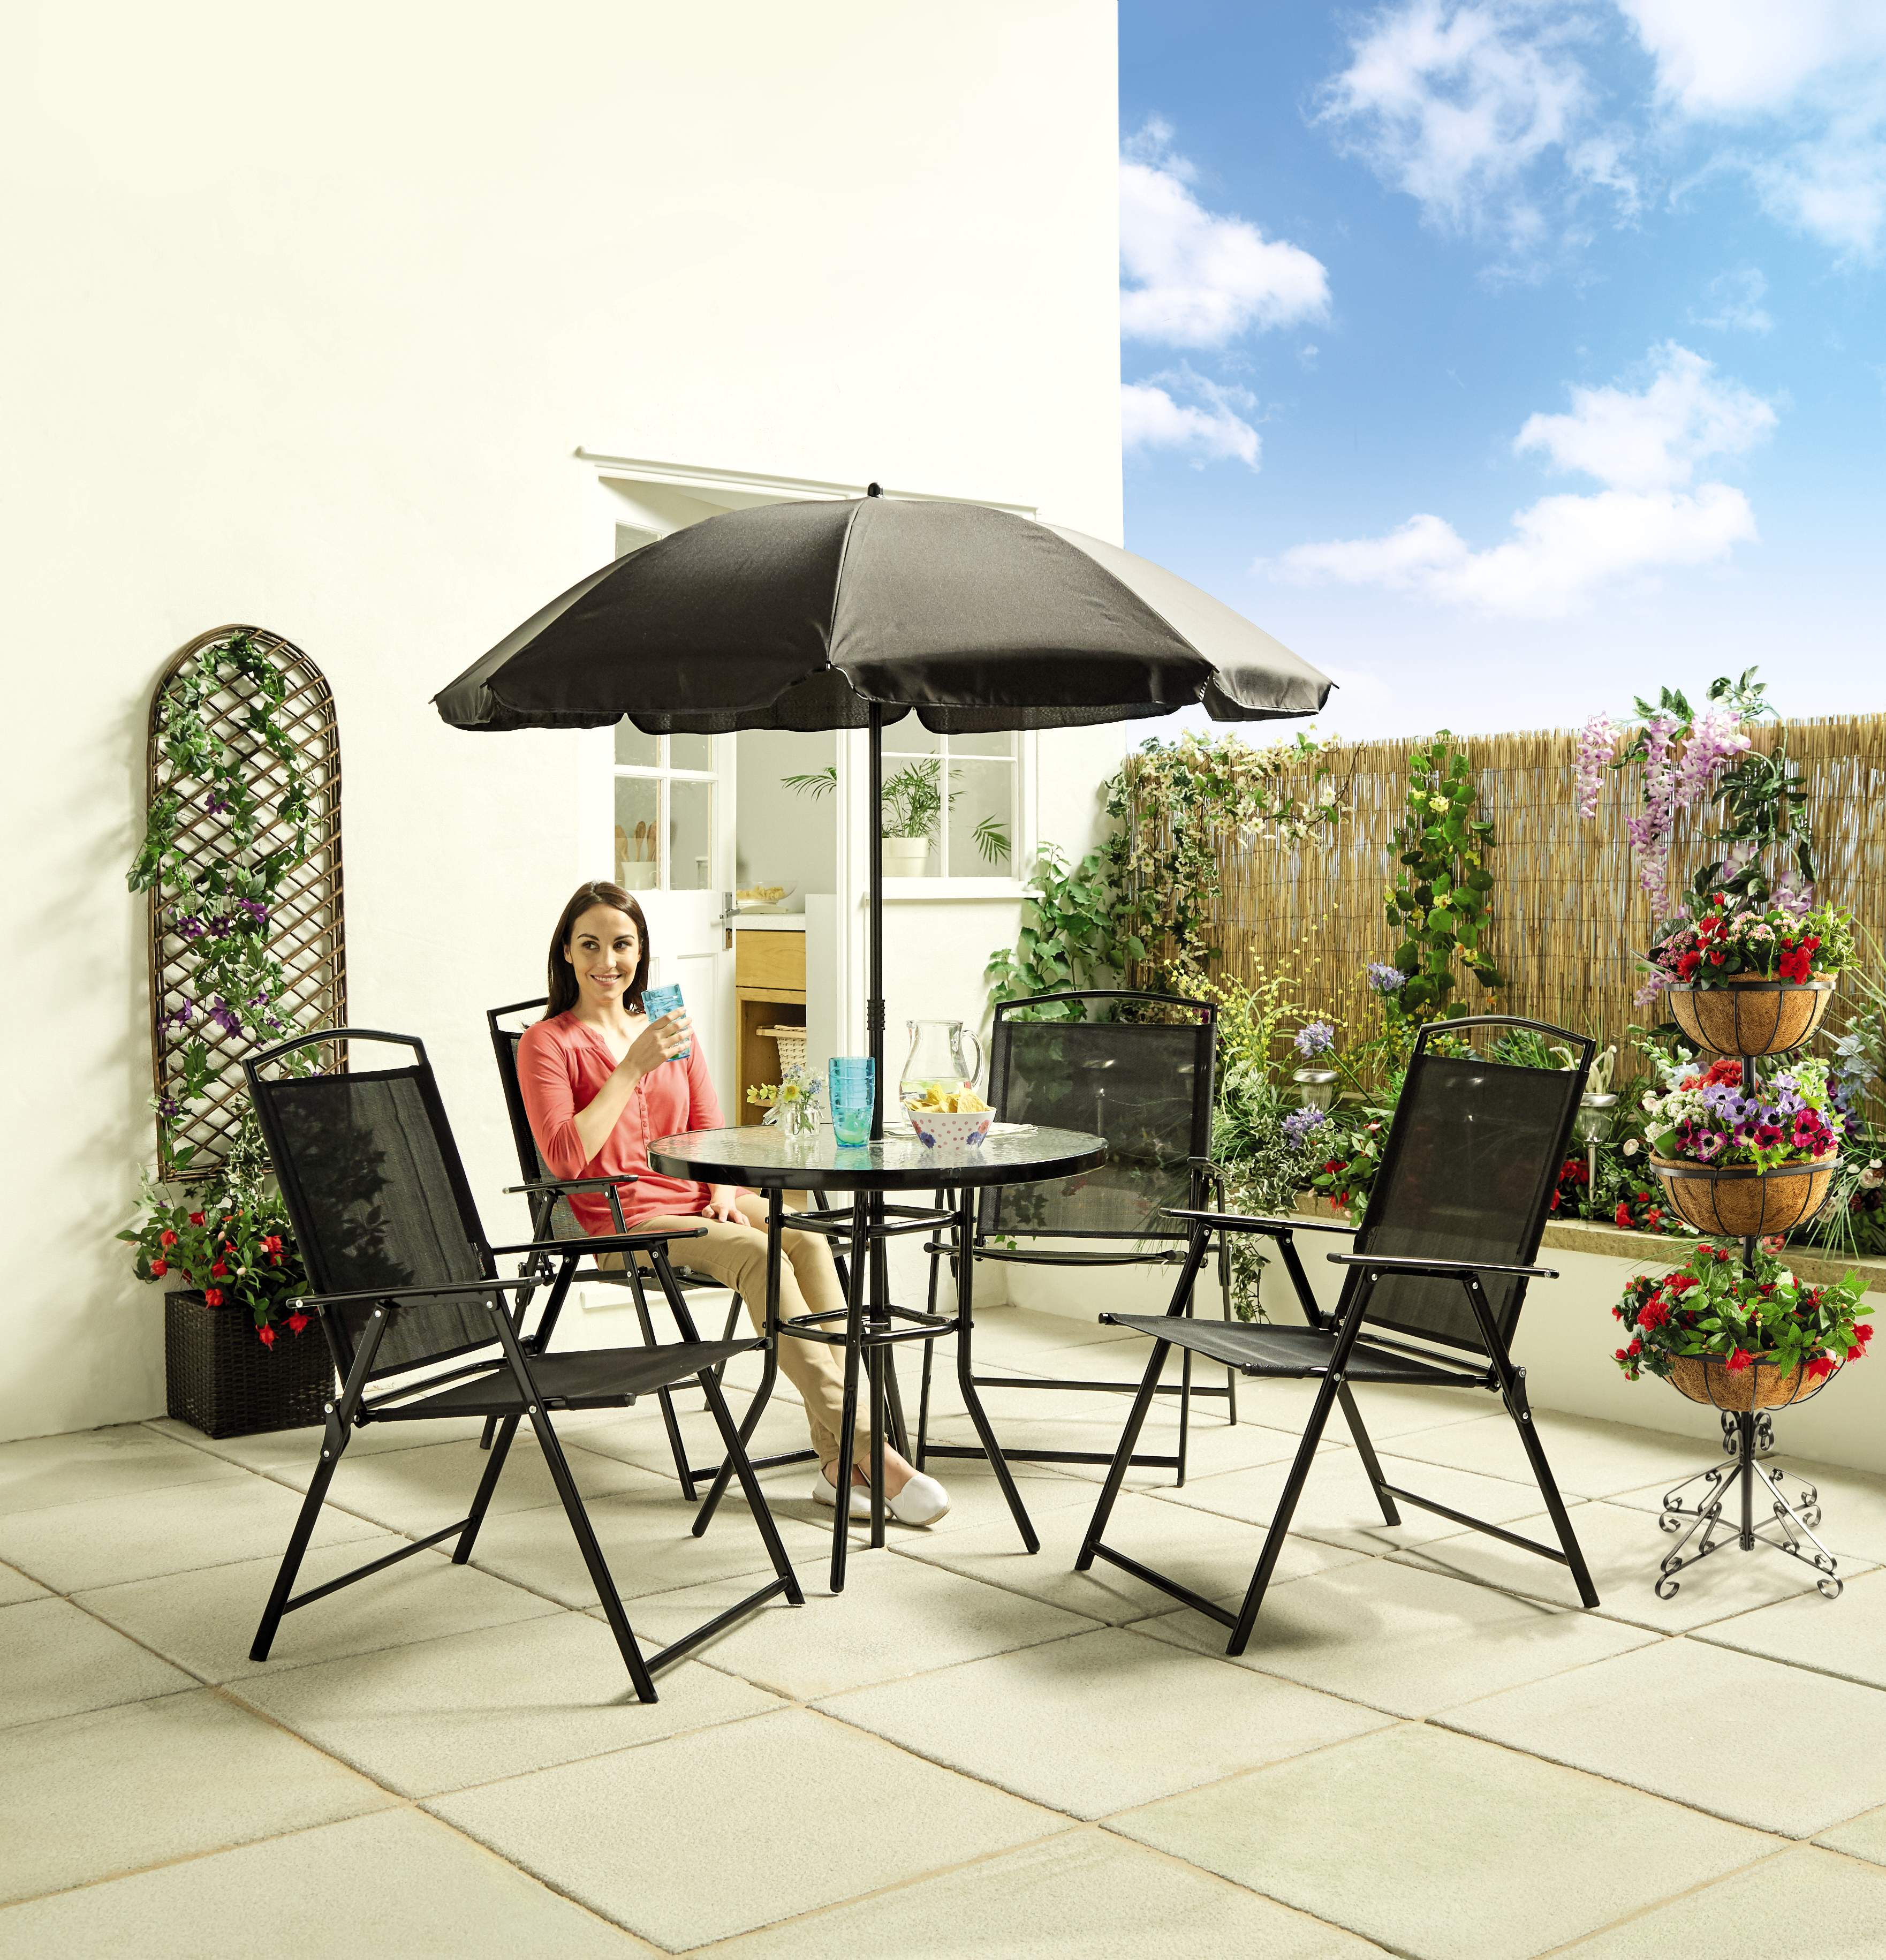 Aldi Special s gardening range in store now